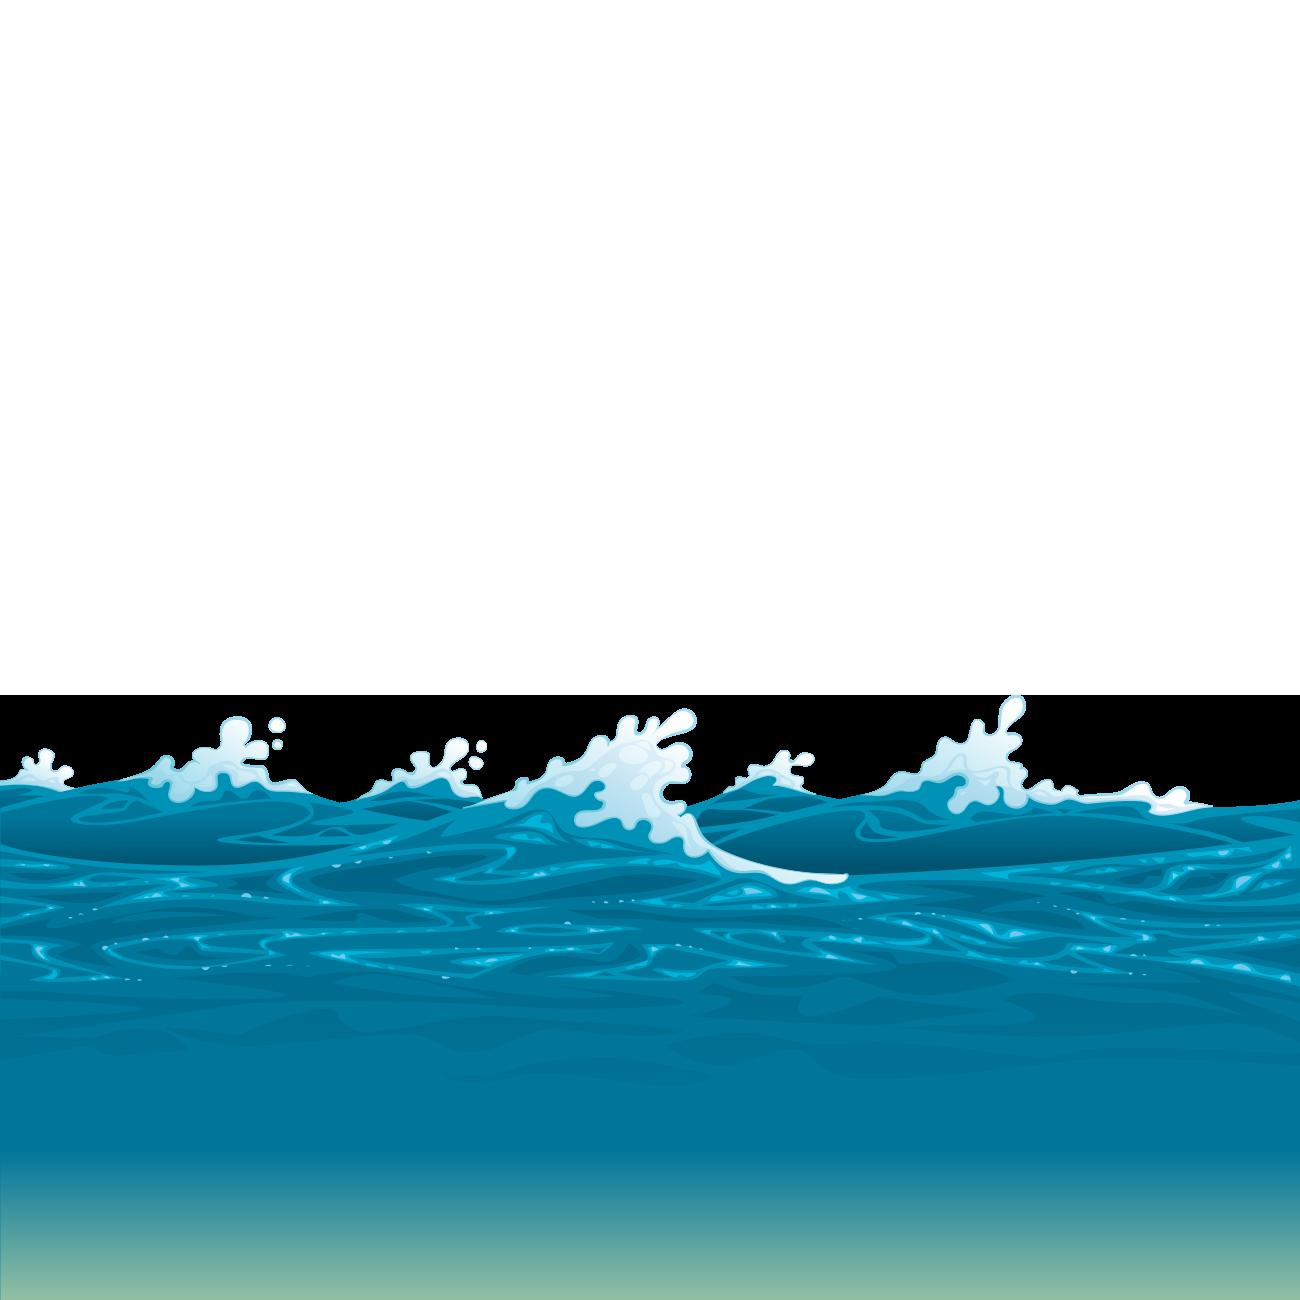 Wallpaper images gallery for. Clipart ocean oceano